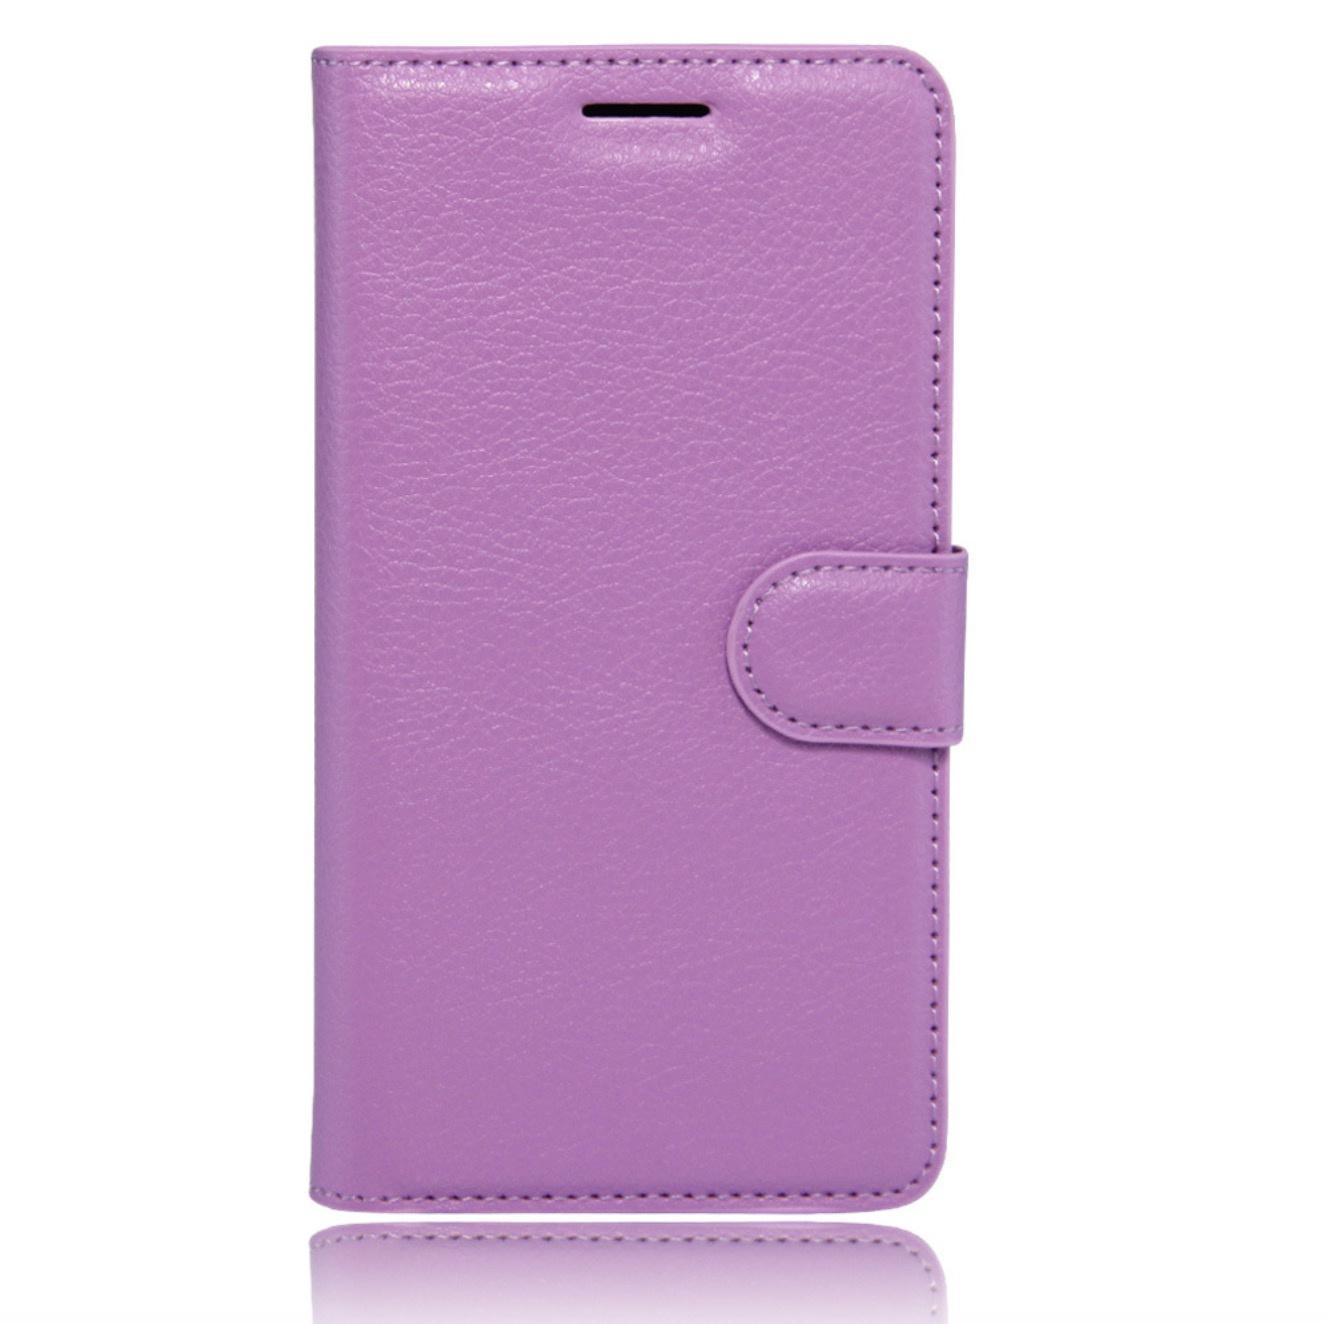 "Чехол-книжка MyPads для Sony Xperia XA / XA Dual 5.0"" (F3113/ F3112 / F3115 /E6533) с мульти-подставкой застёжкой и визитницей фиолетовый"